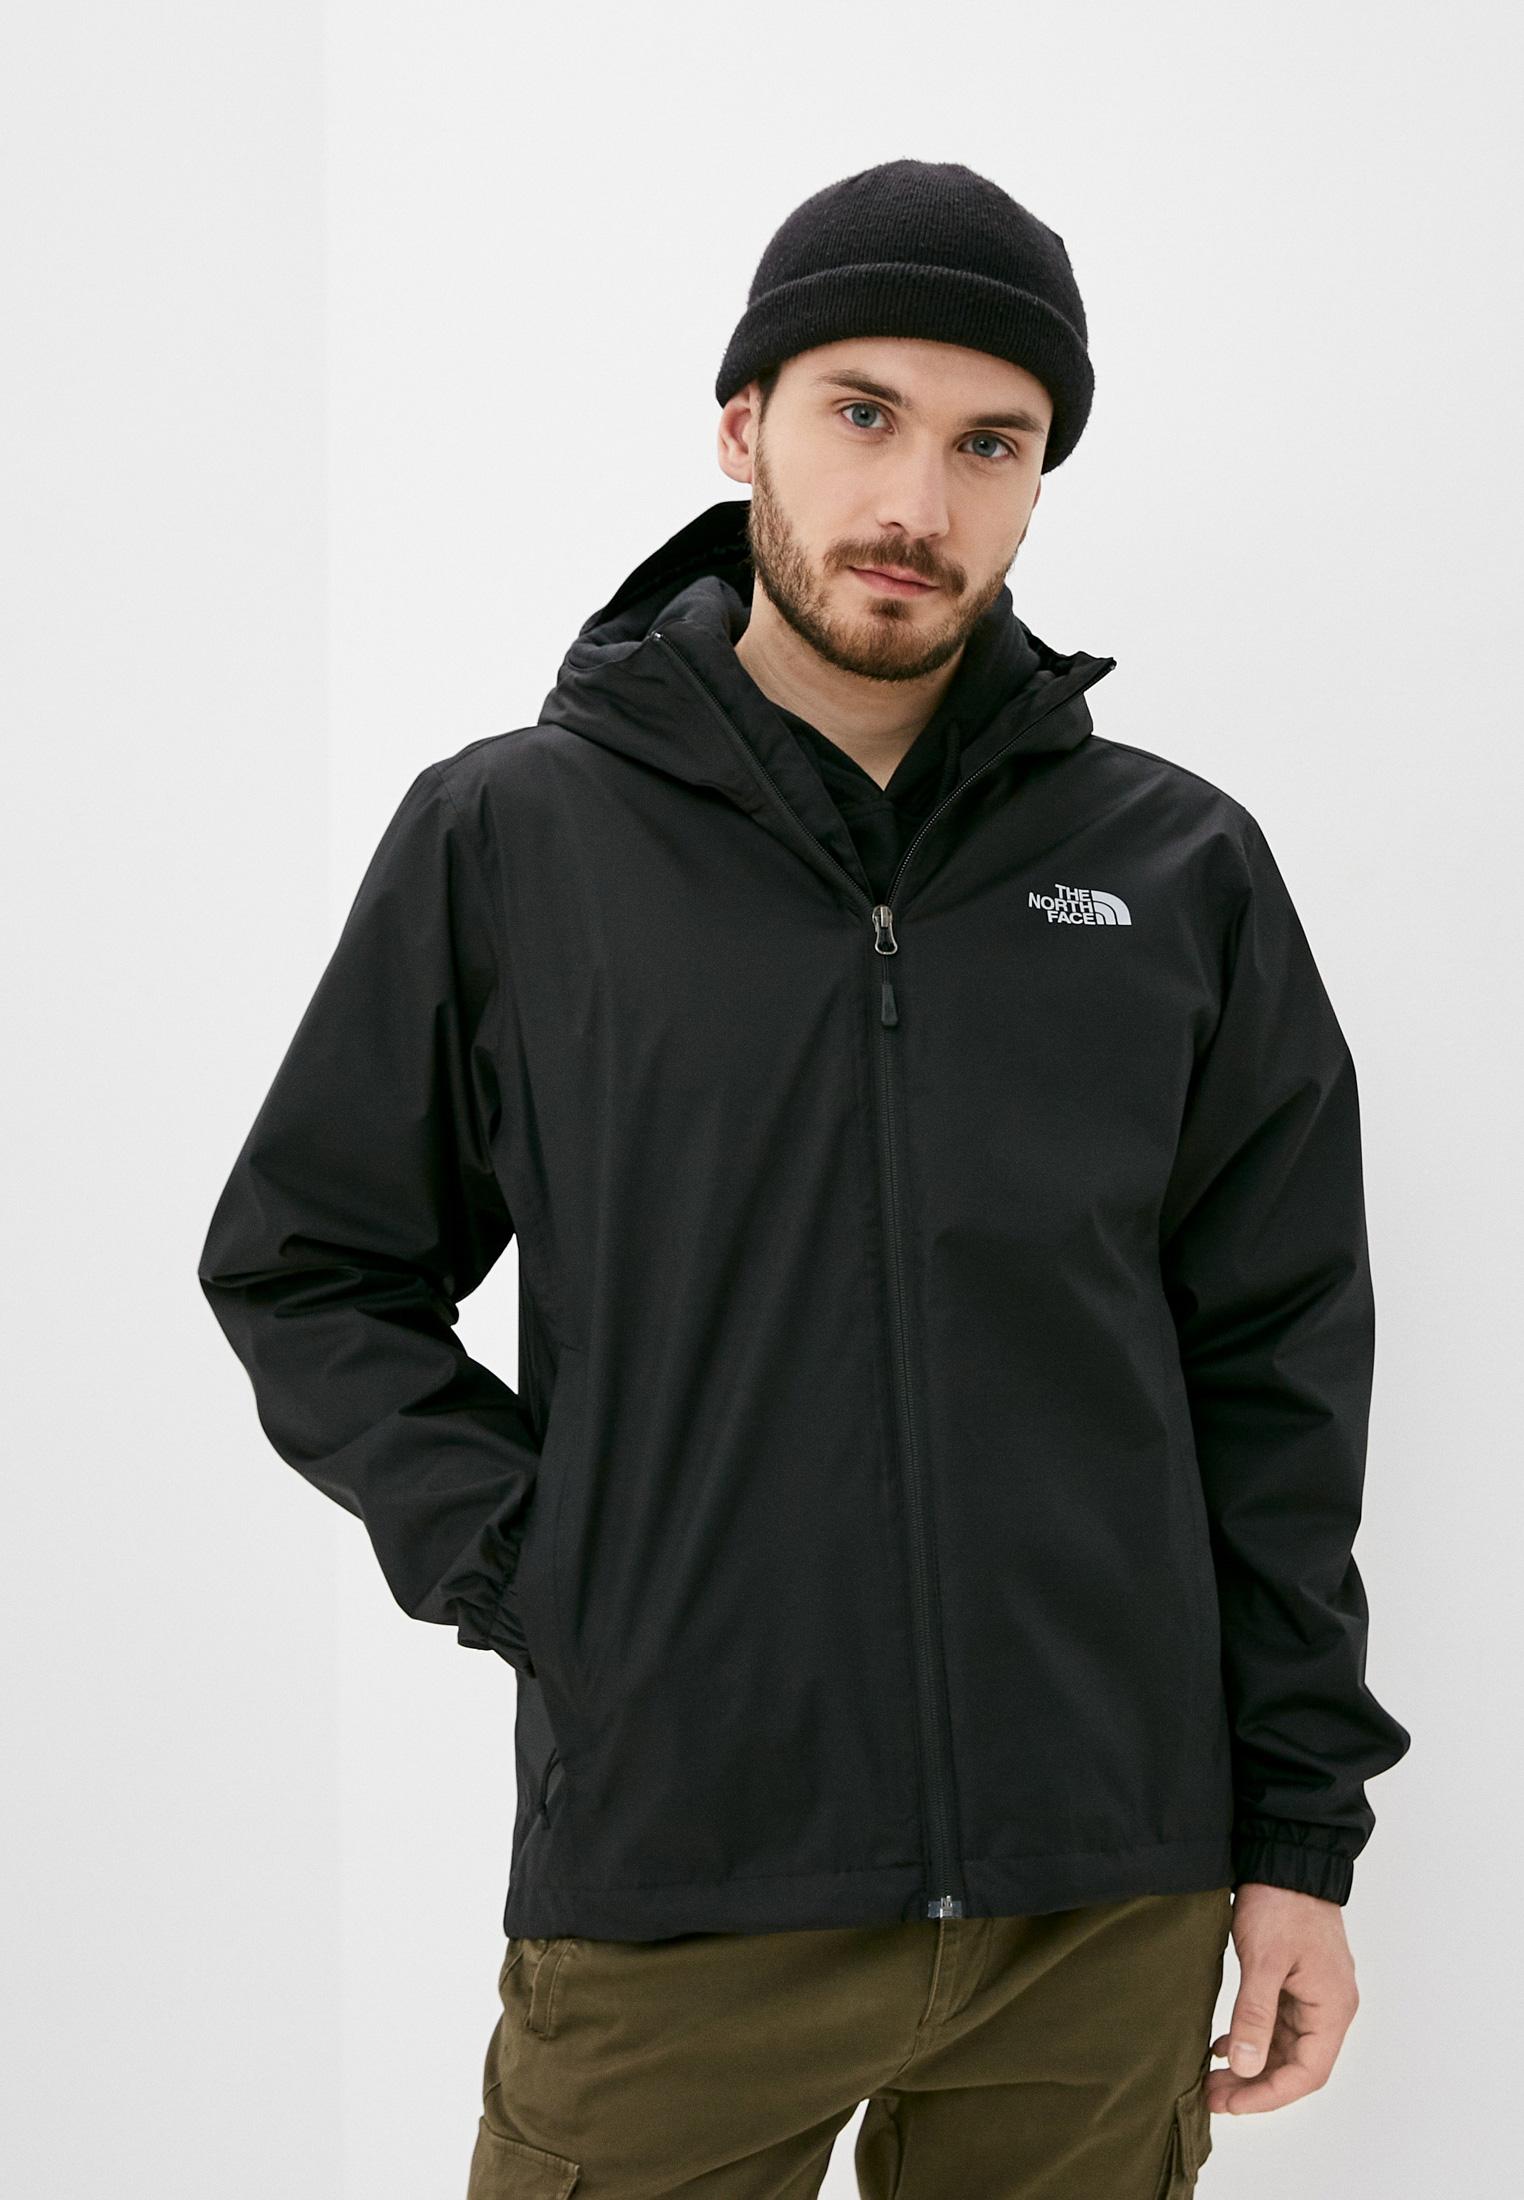 Мужская верхняя одежда The North Face (Норт Фейс) Ветровка The North Face